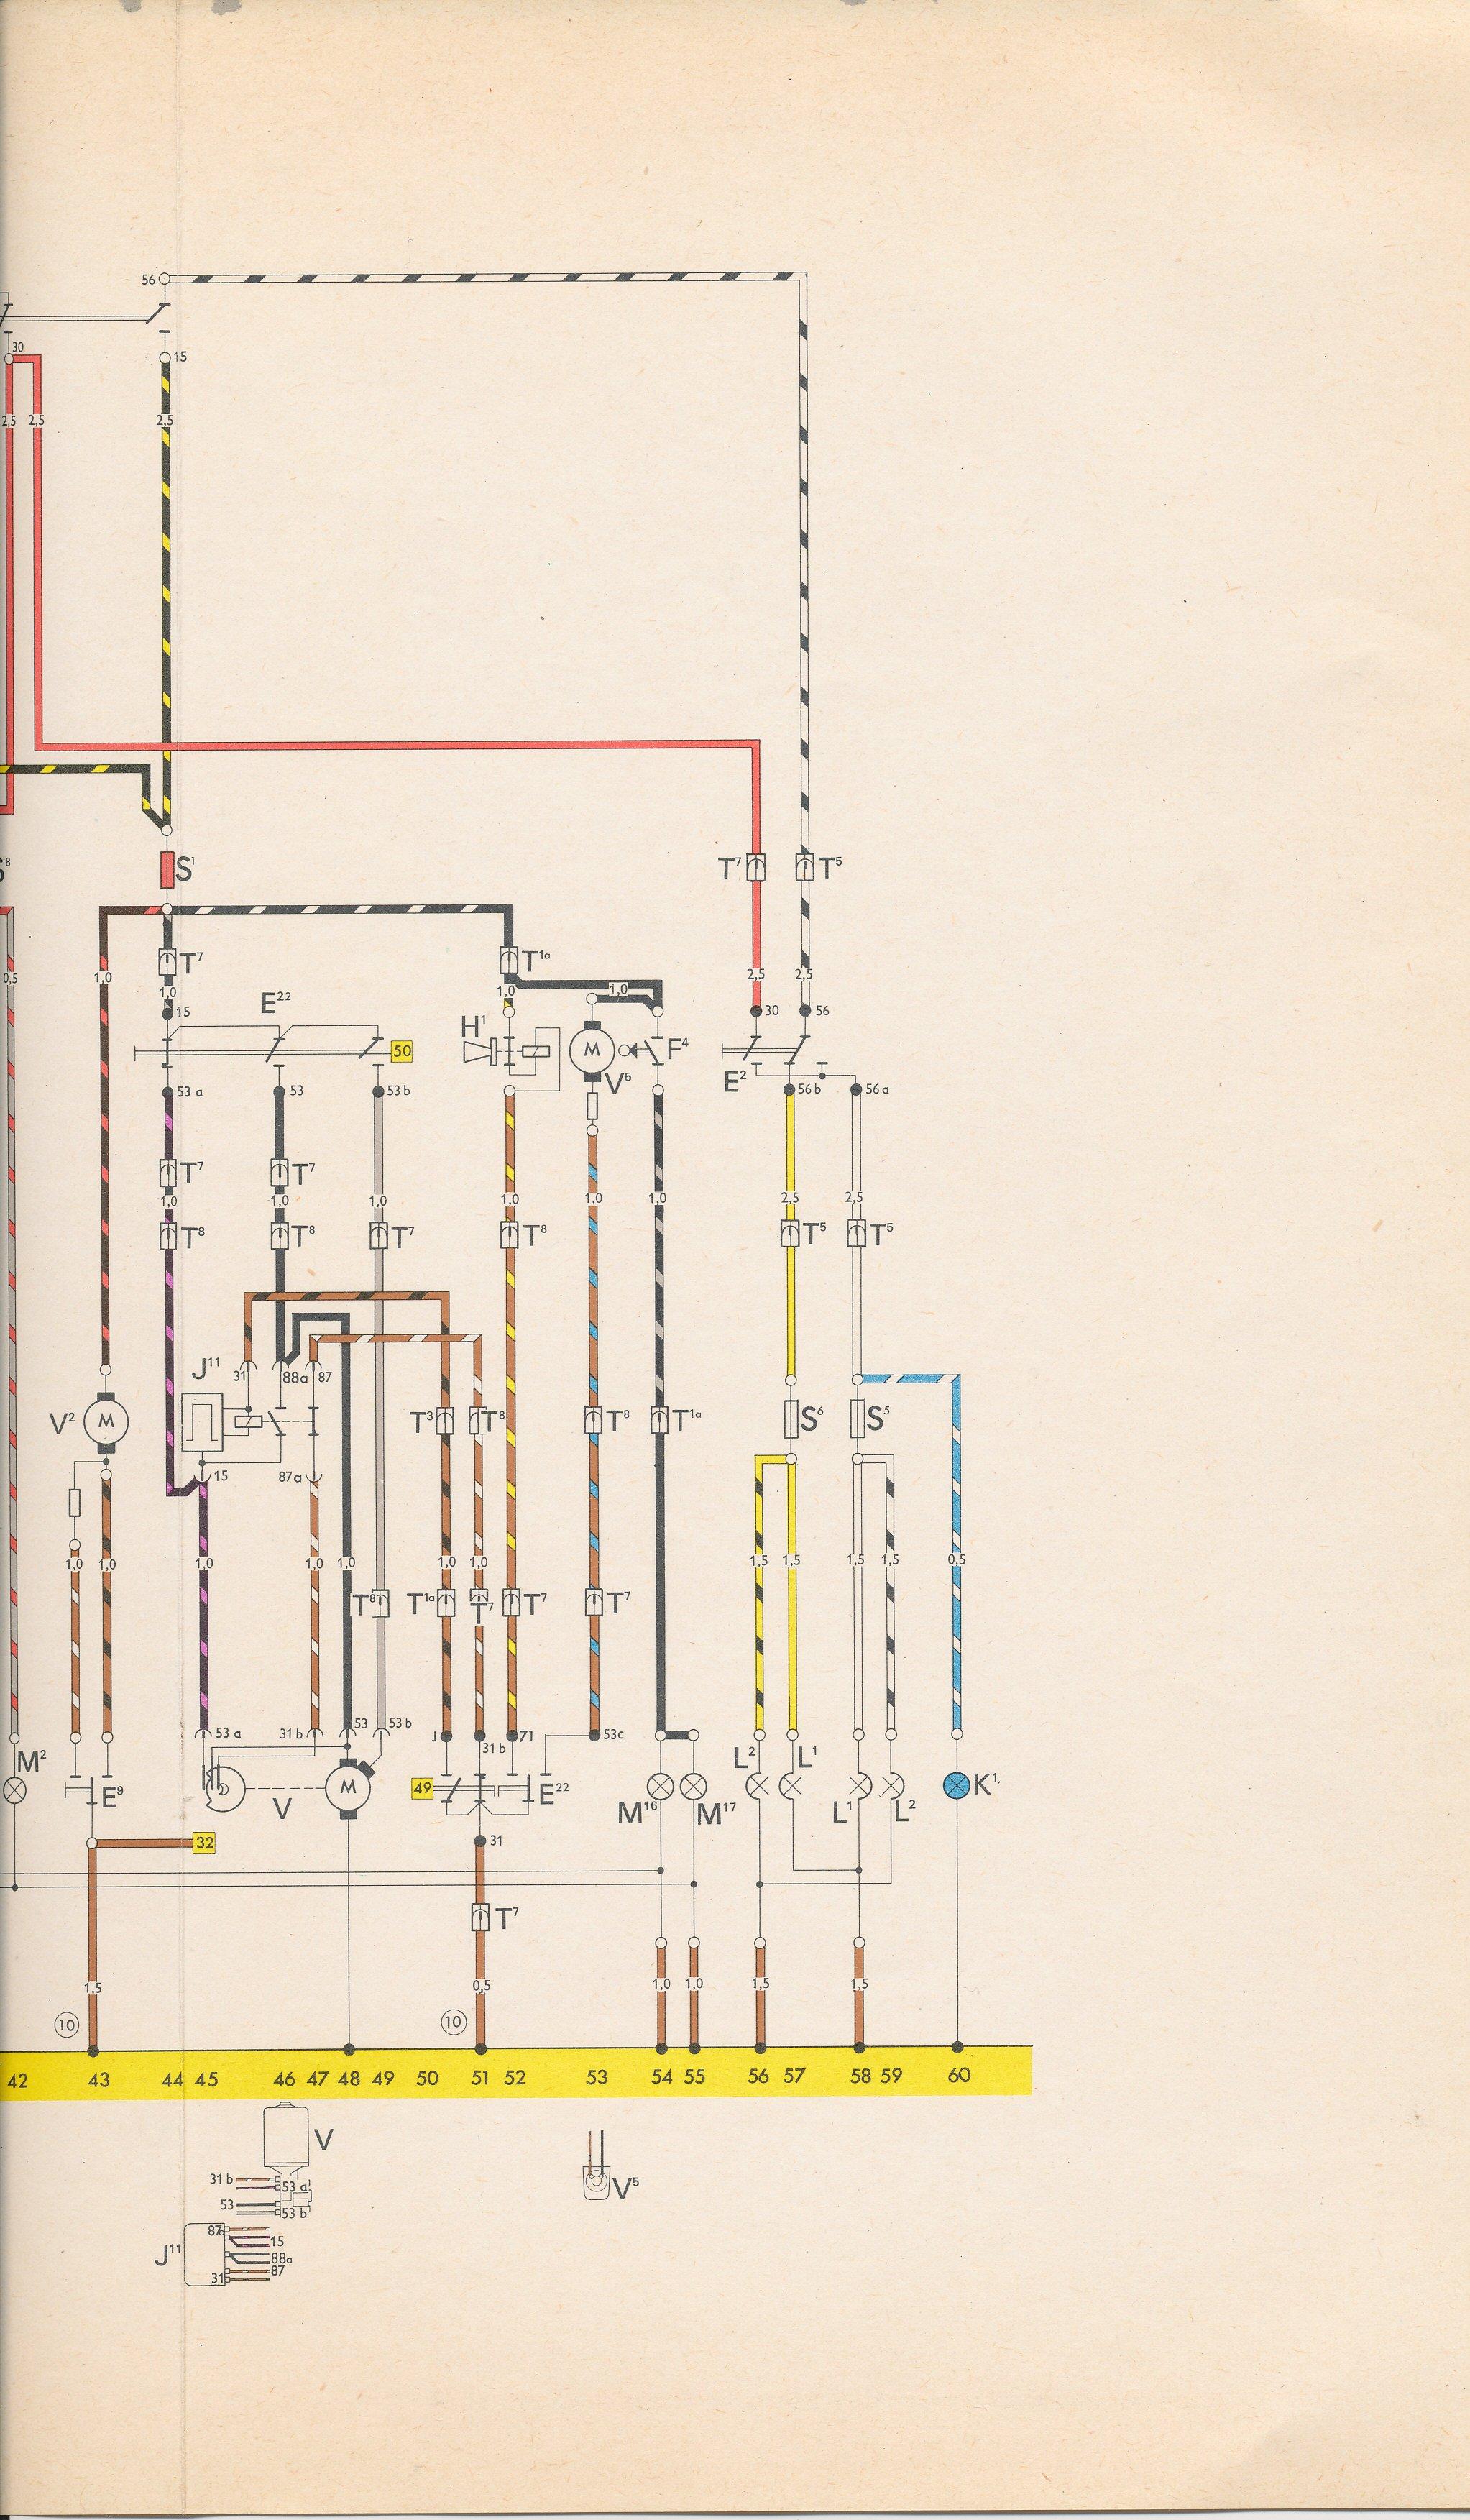 ididit steering column wiring diagram msd 6m 2 diagrams for 65 mustang